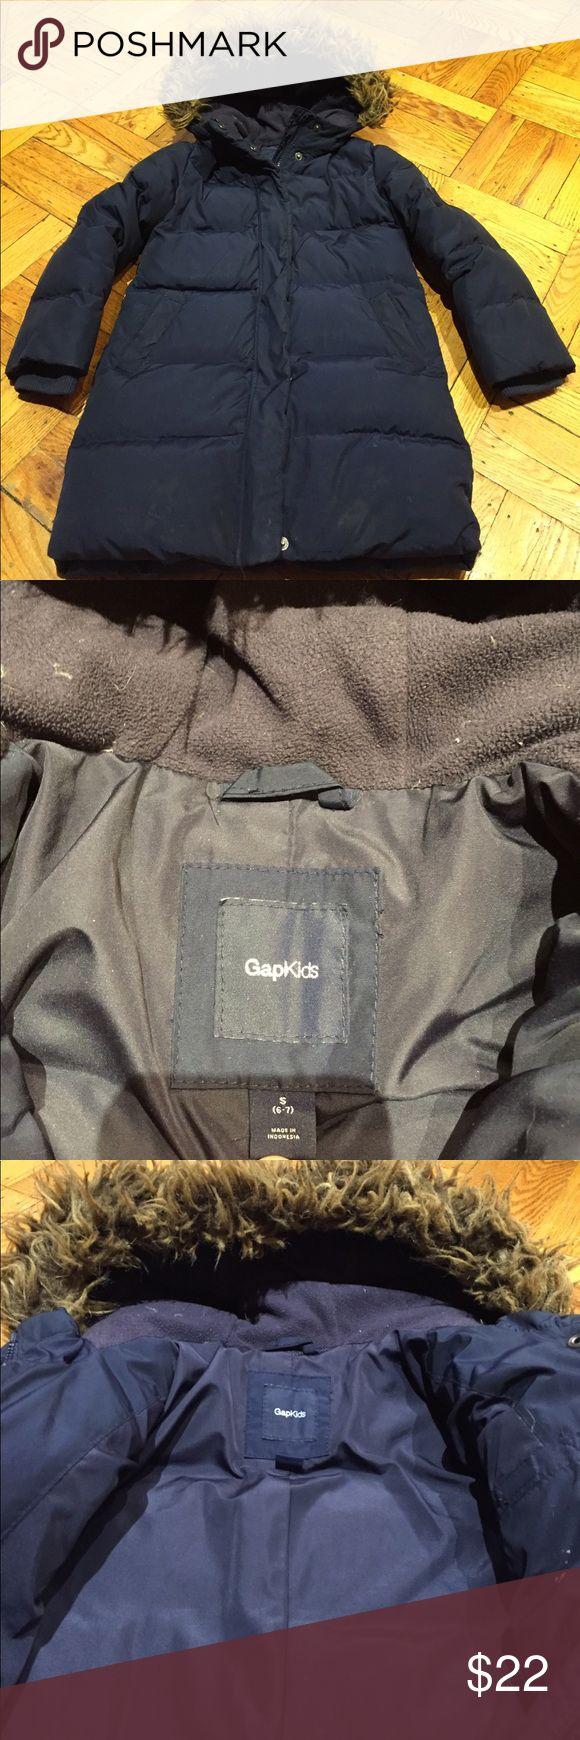 ☃️Winter puffer jacket GAP☃️ unisex ☃️Winter puffer jacket GAP☃️ unisex size small (6/7) worn condition but still keep your little one warm GAP Jackets & Coats Puffers